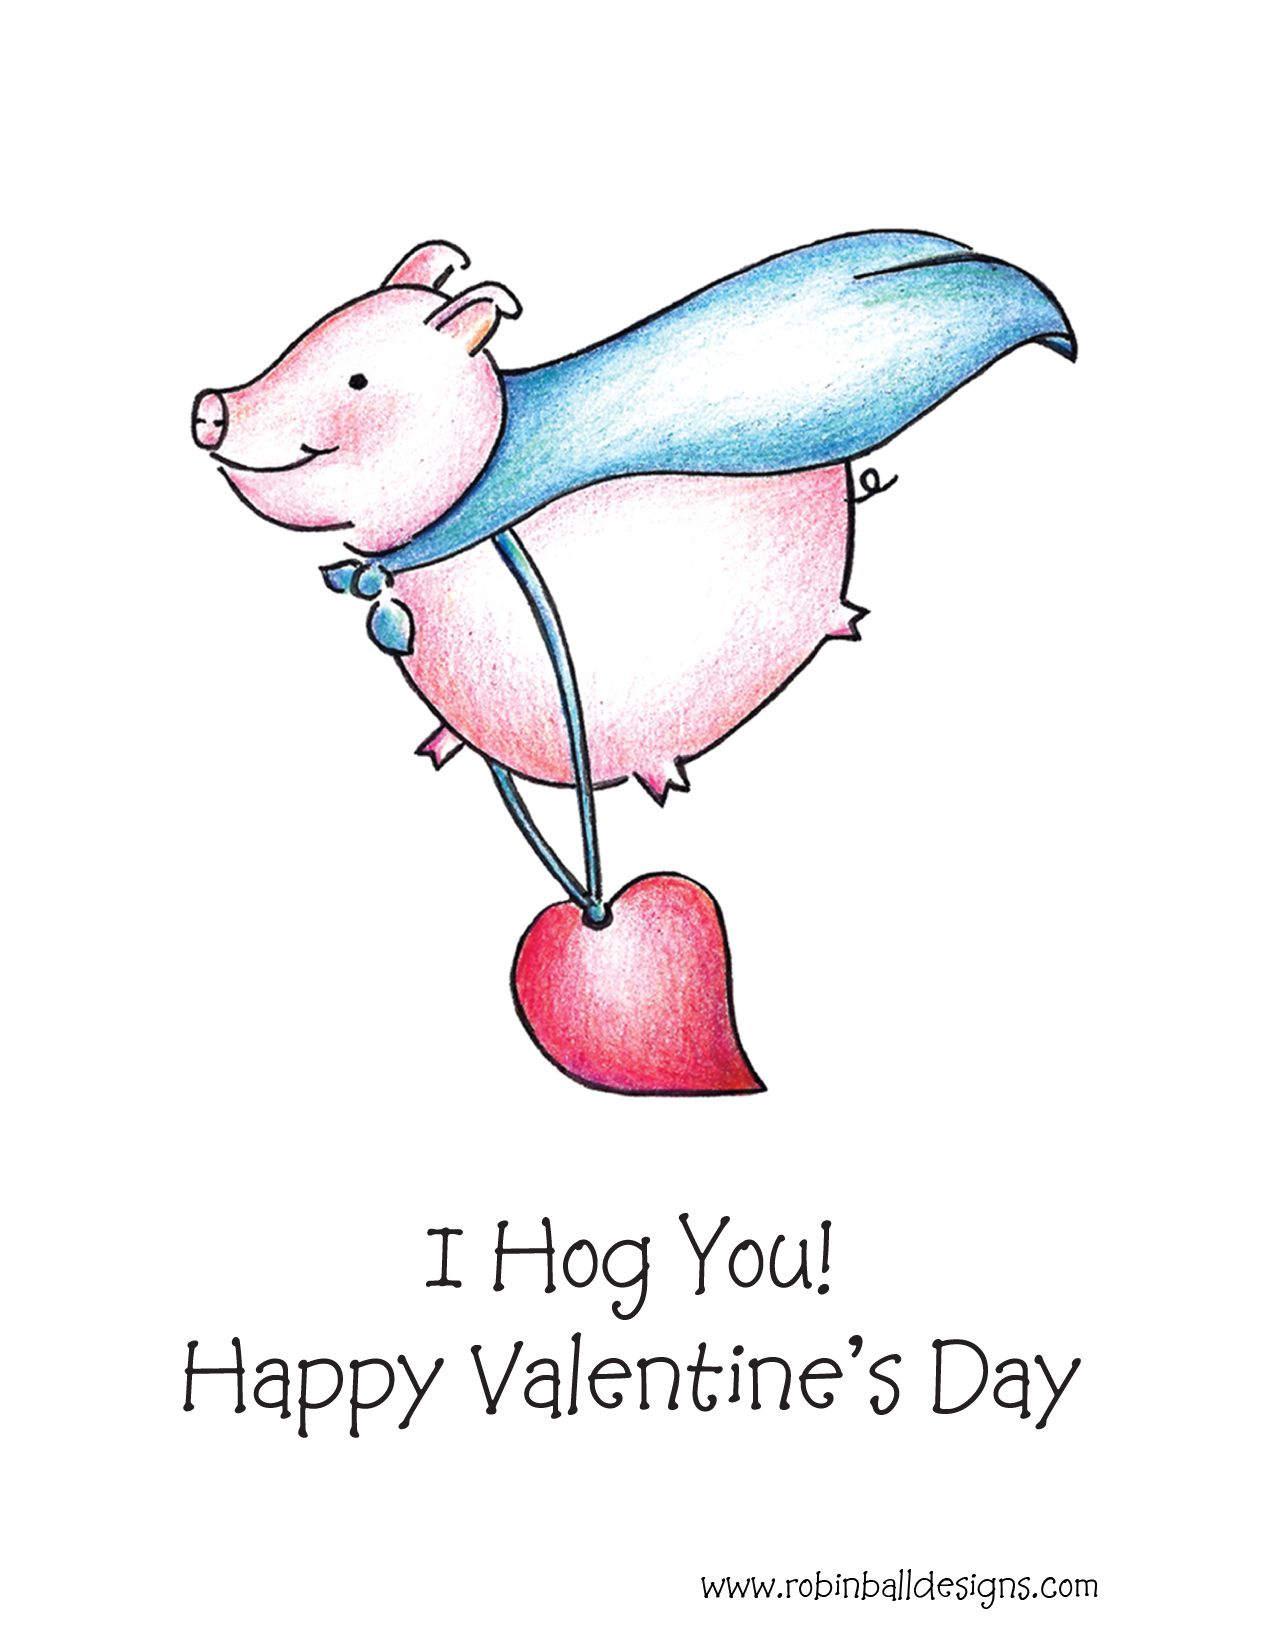 $3 00 Valentine Flying Pig Greeting Card This humorous handmade